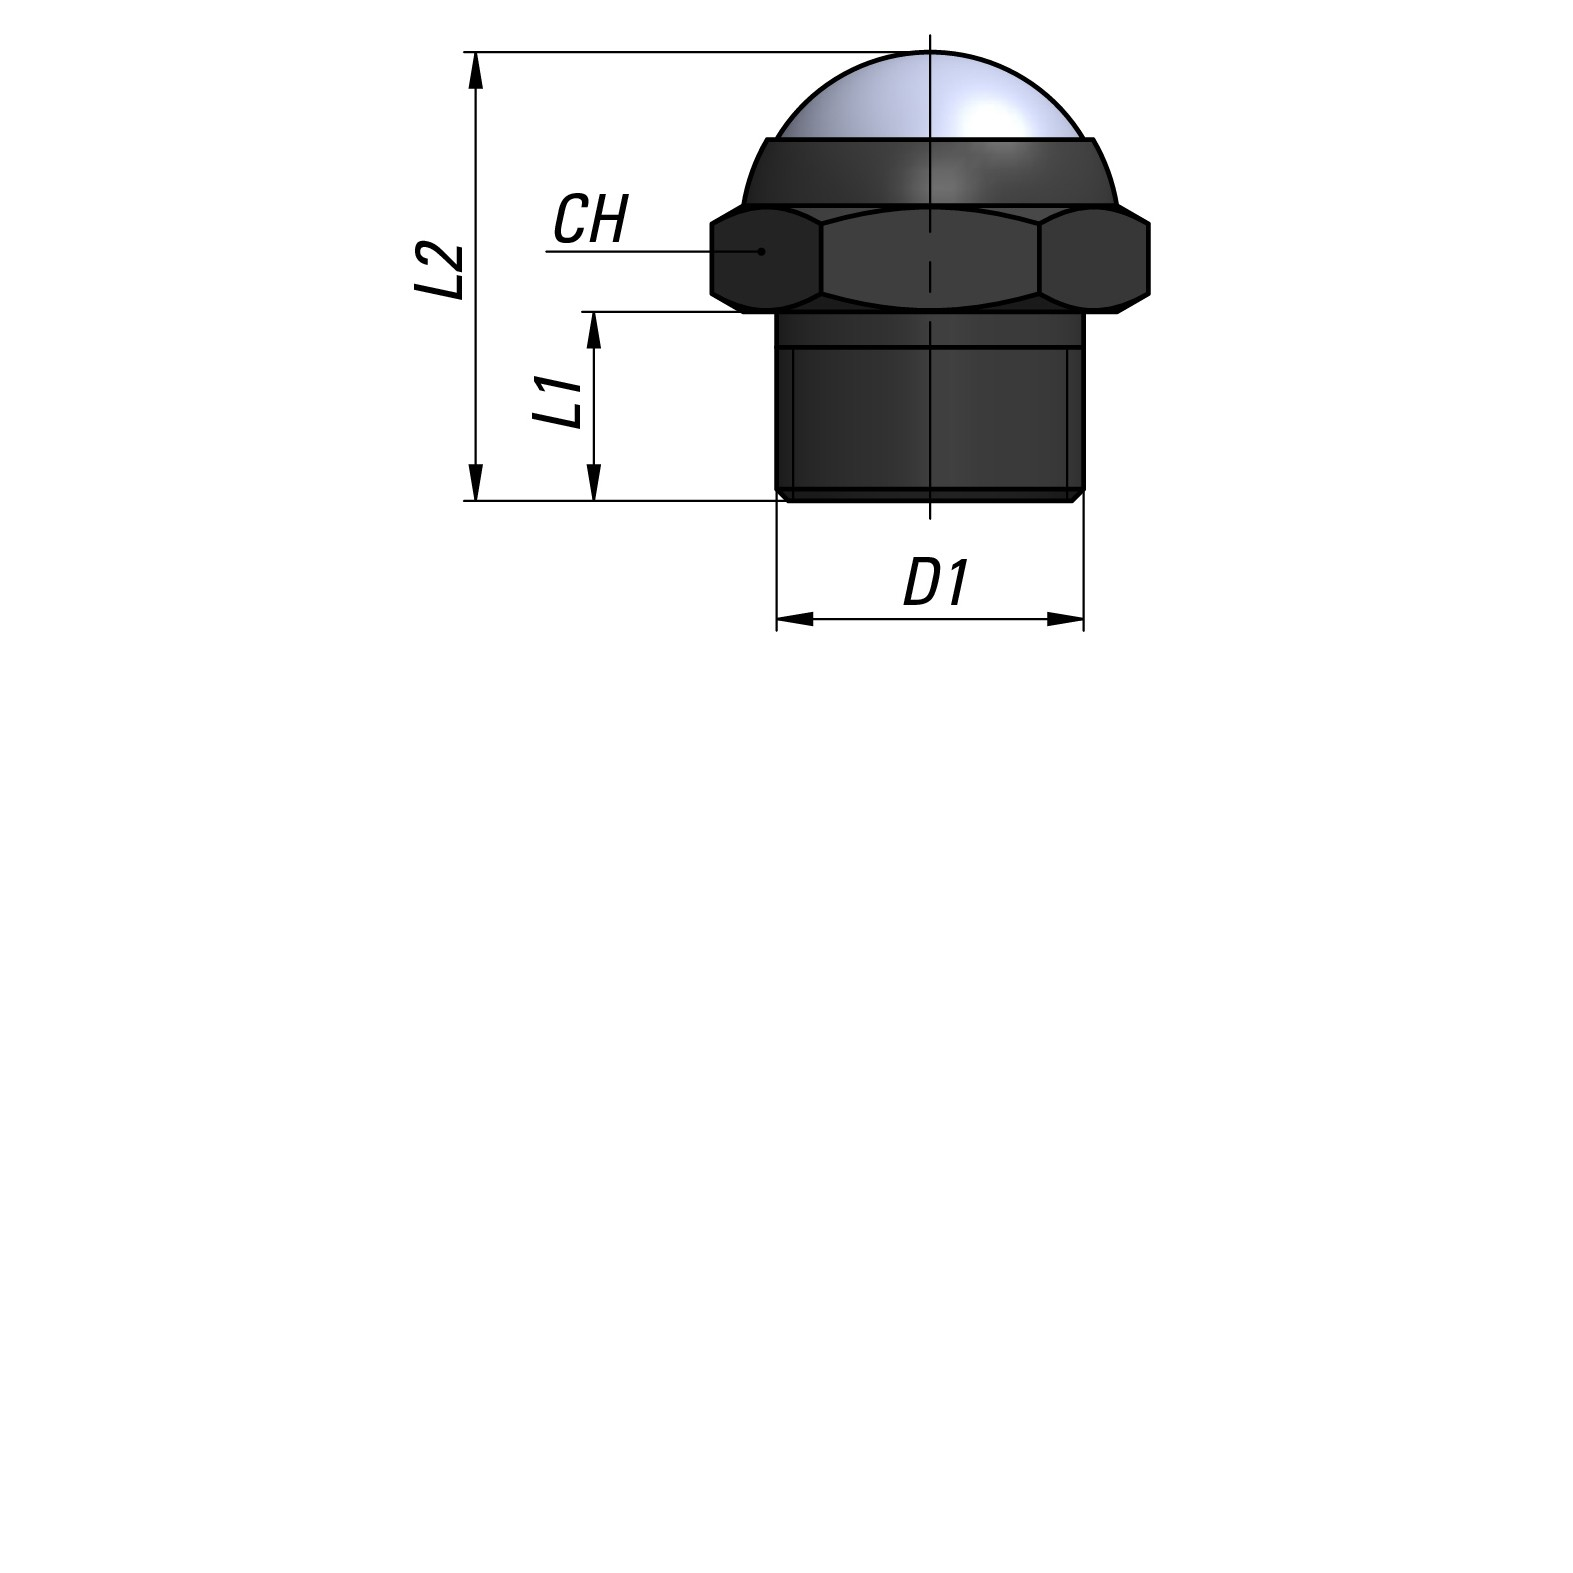 MV11 00 14 -FEP